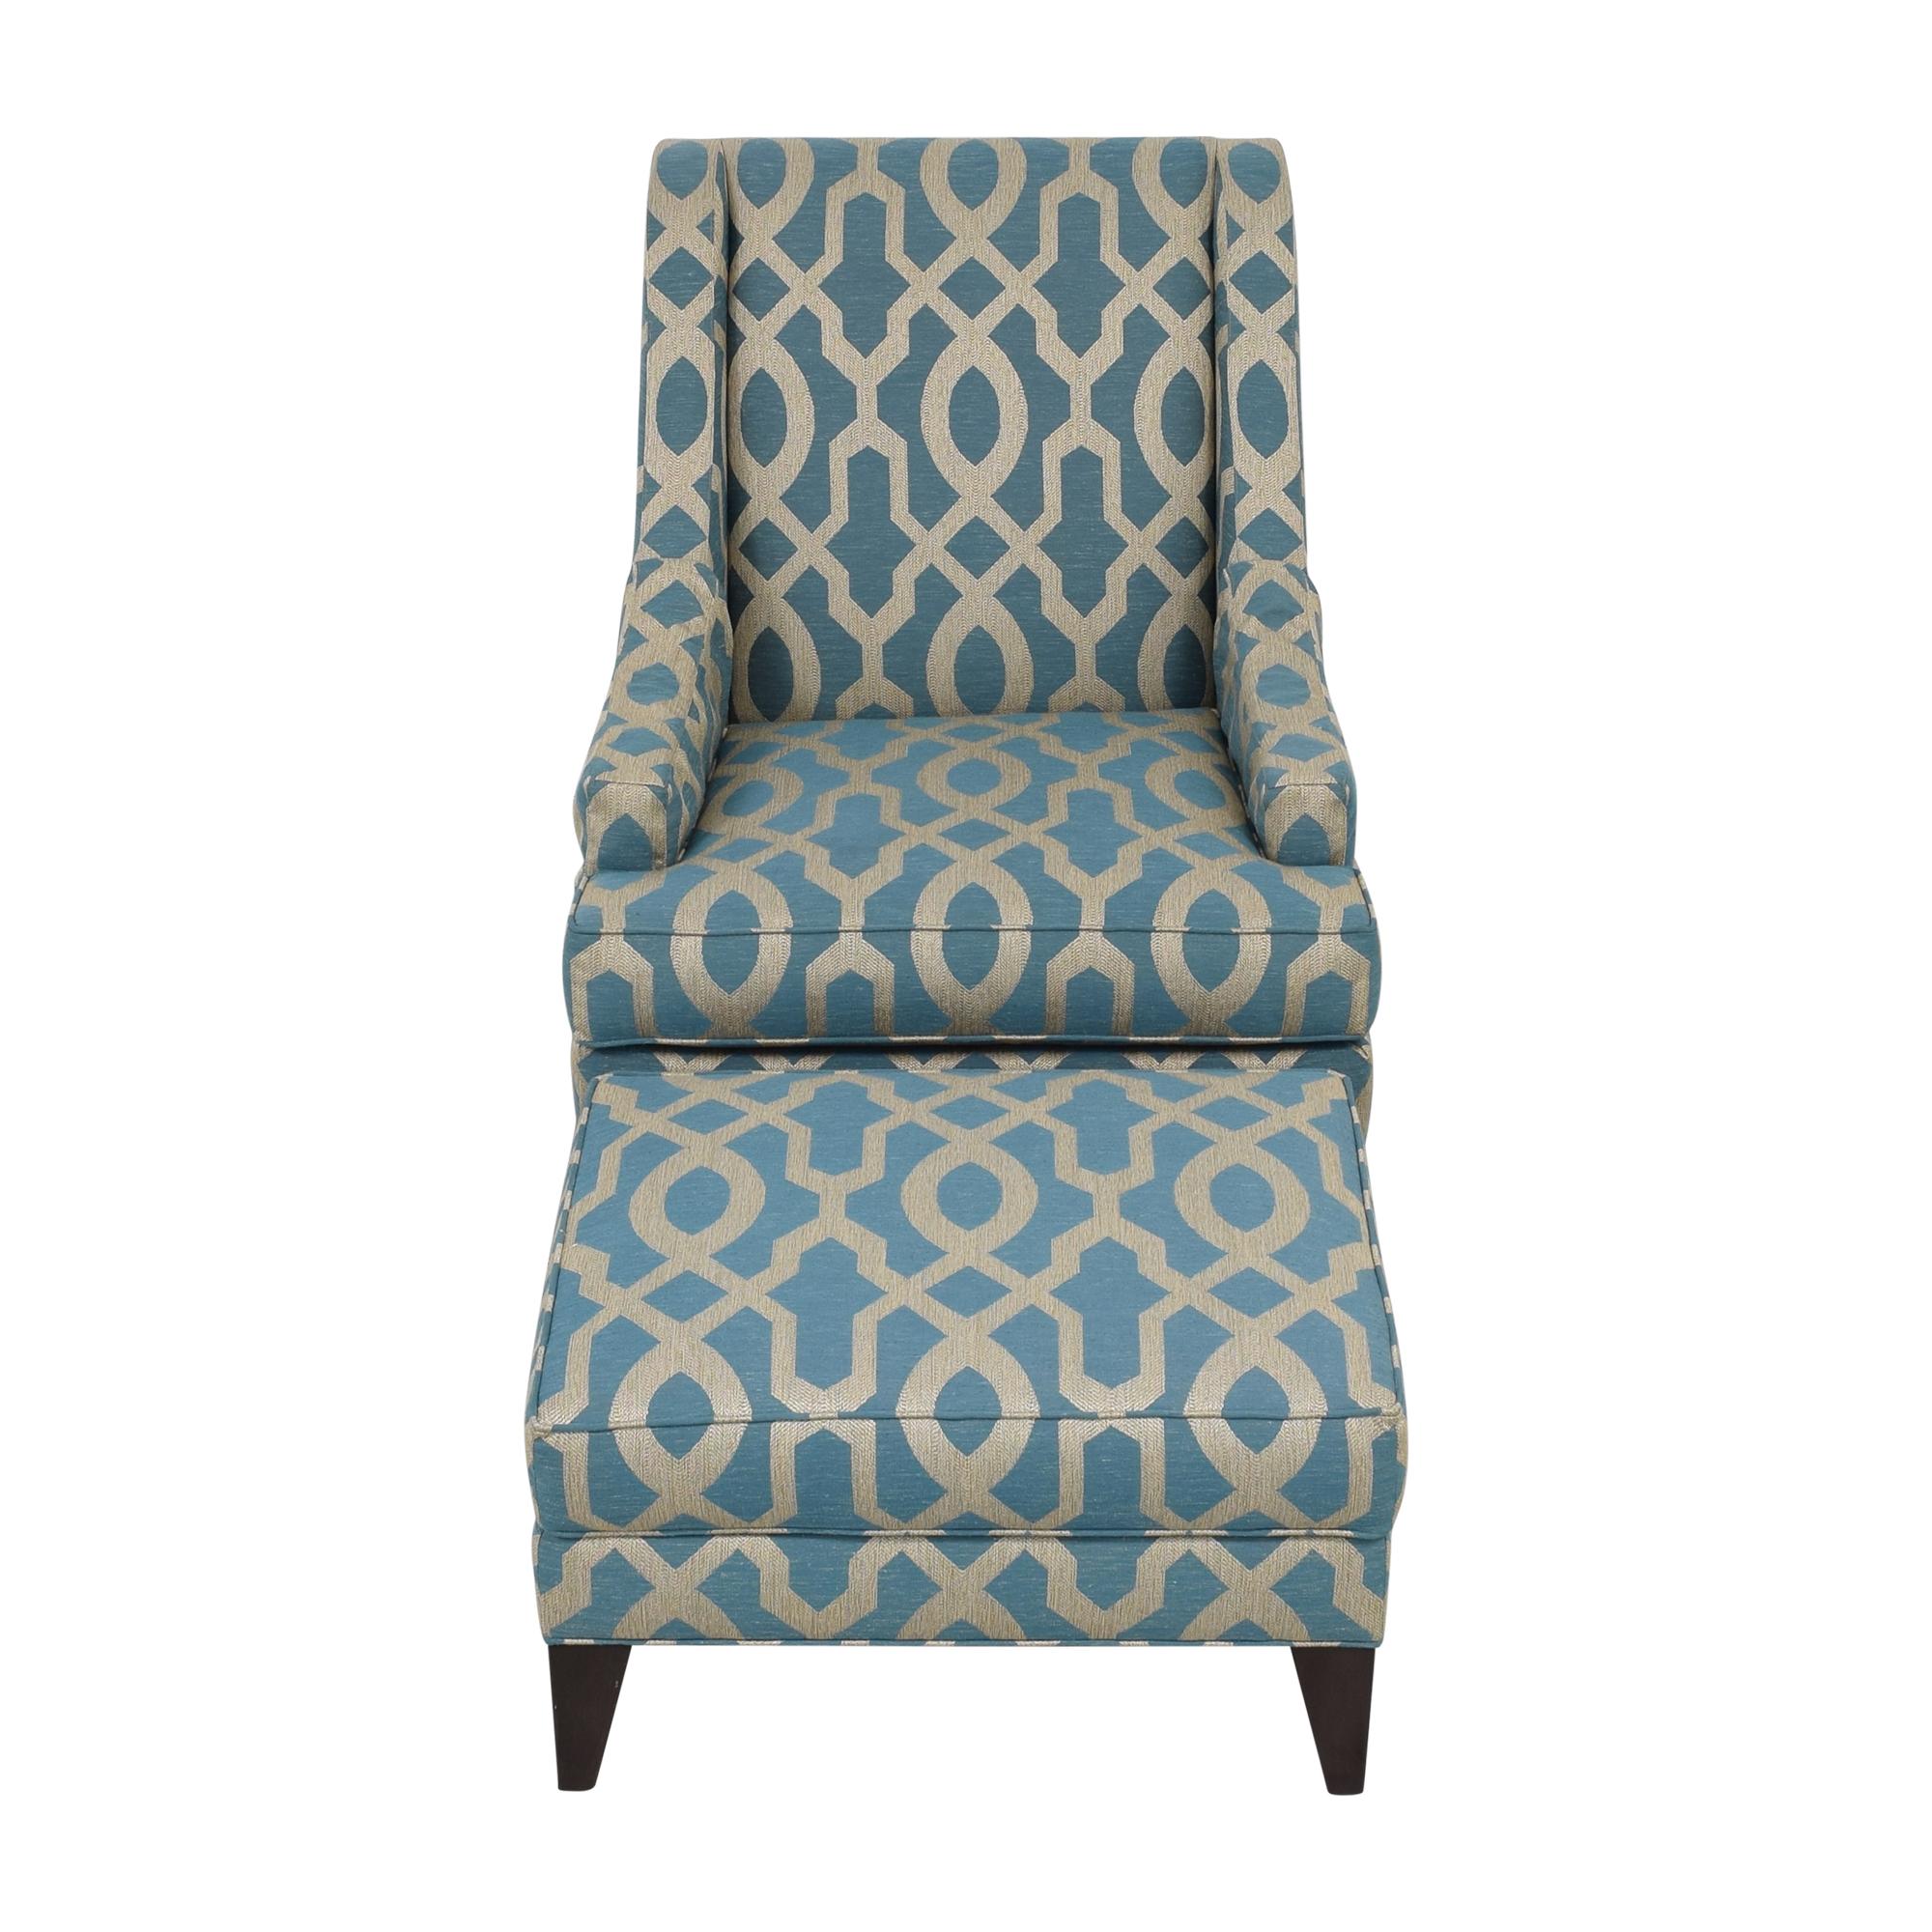 Ethan Allen Ethan Allen Emerson Chair and Ottoman ct